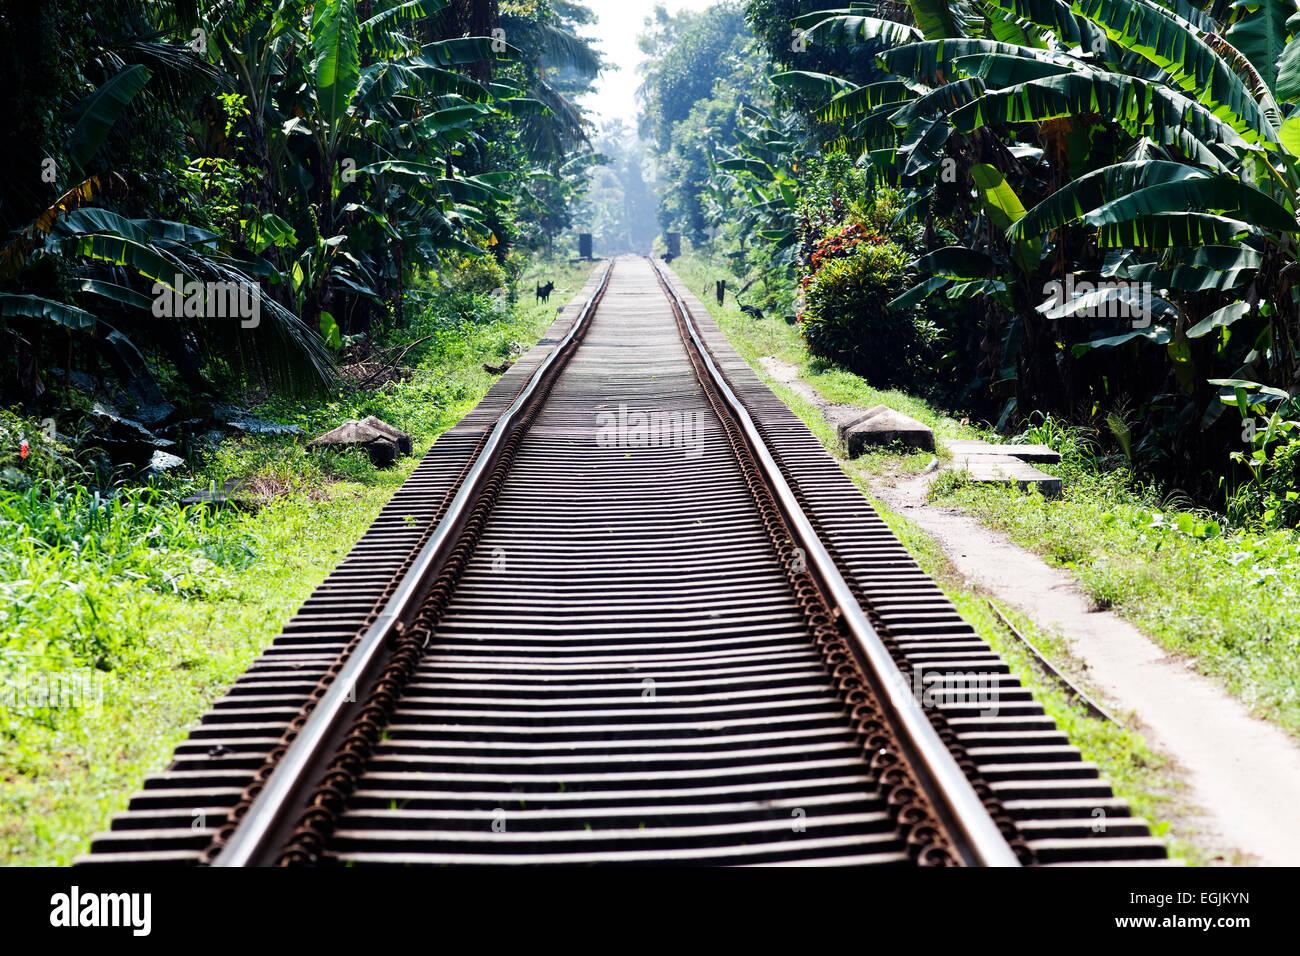 Railway tracks in jungle - Stock Image